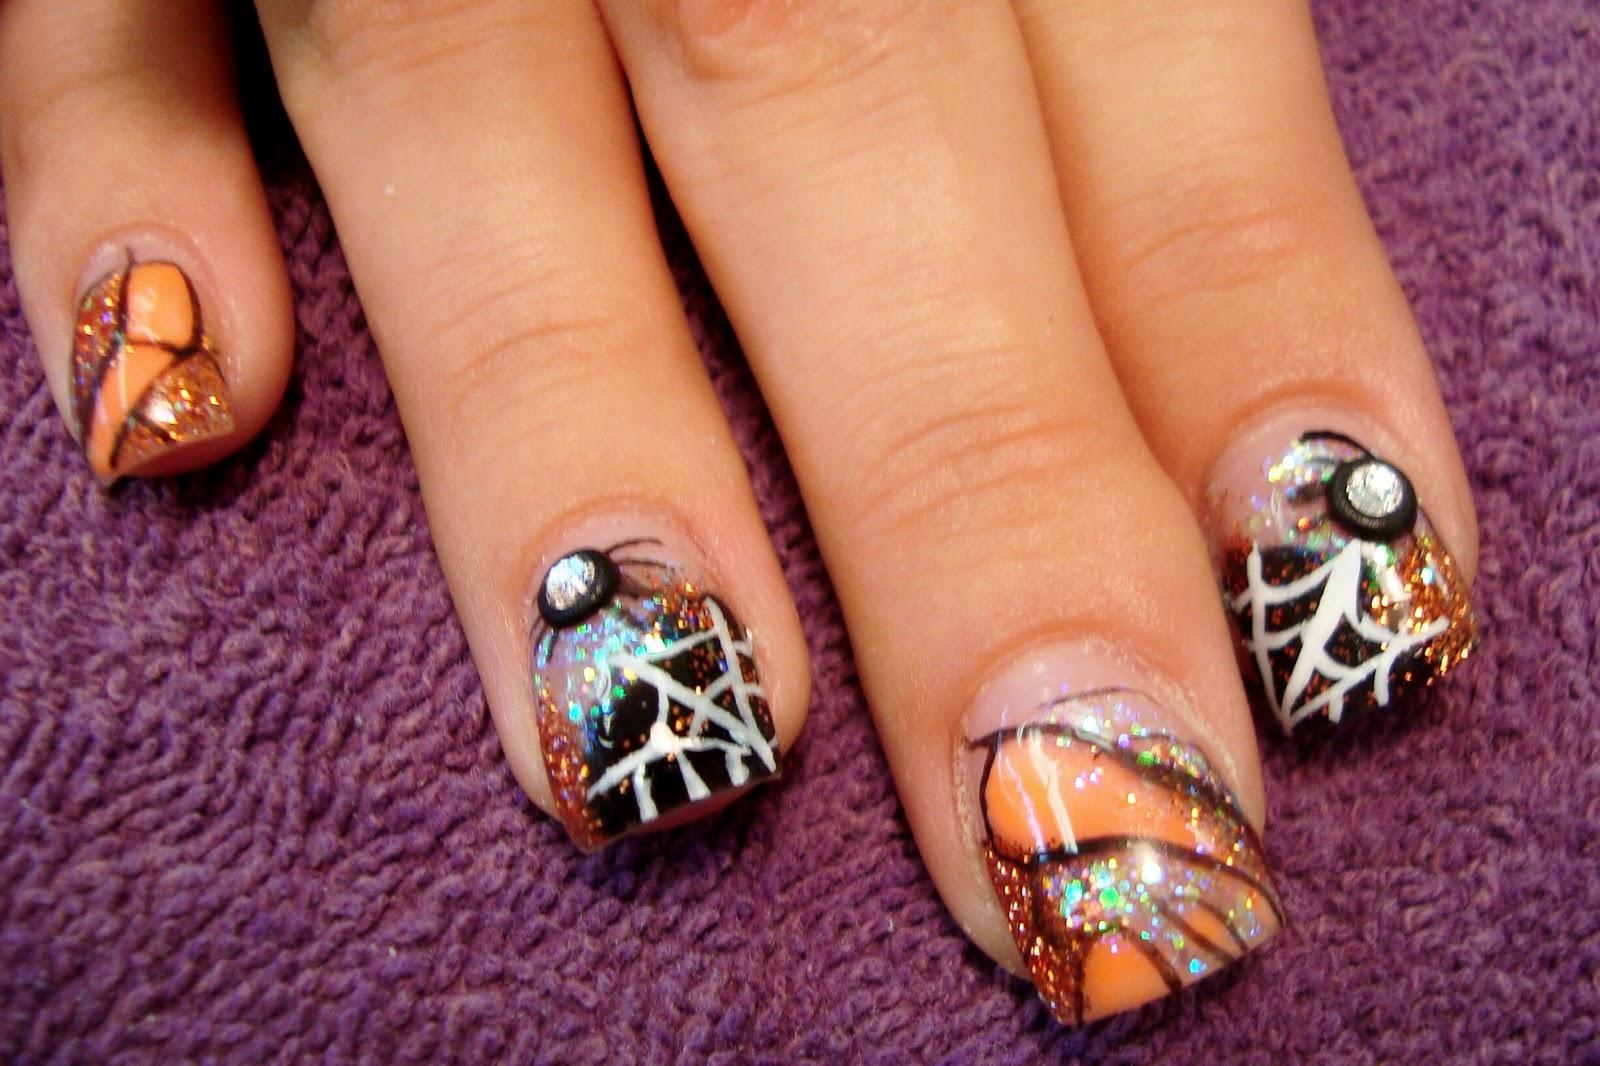 acrylic nails dangers photo - 1